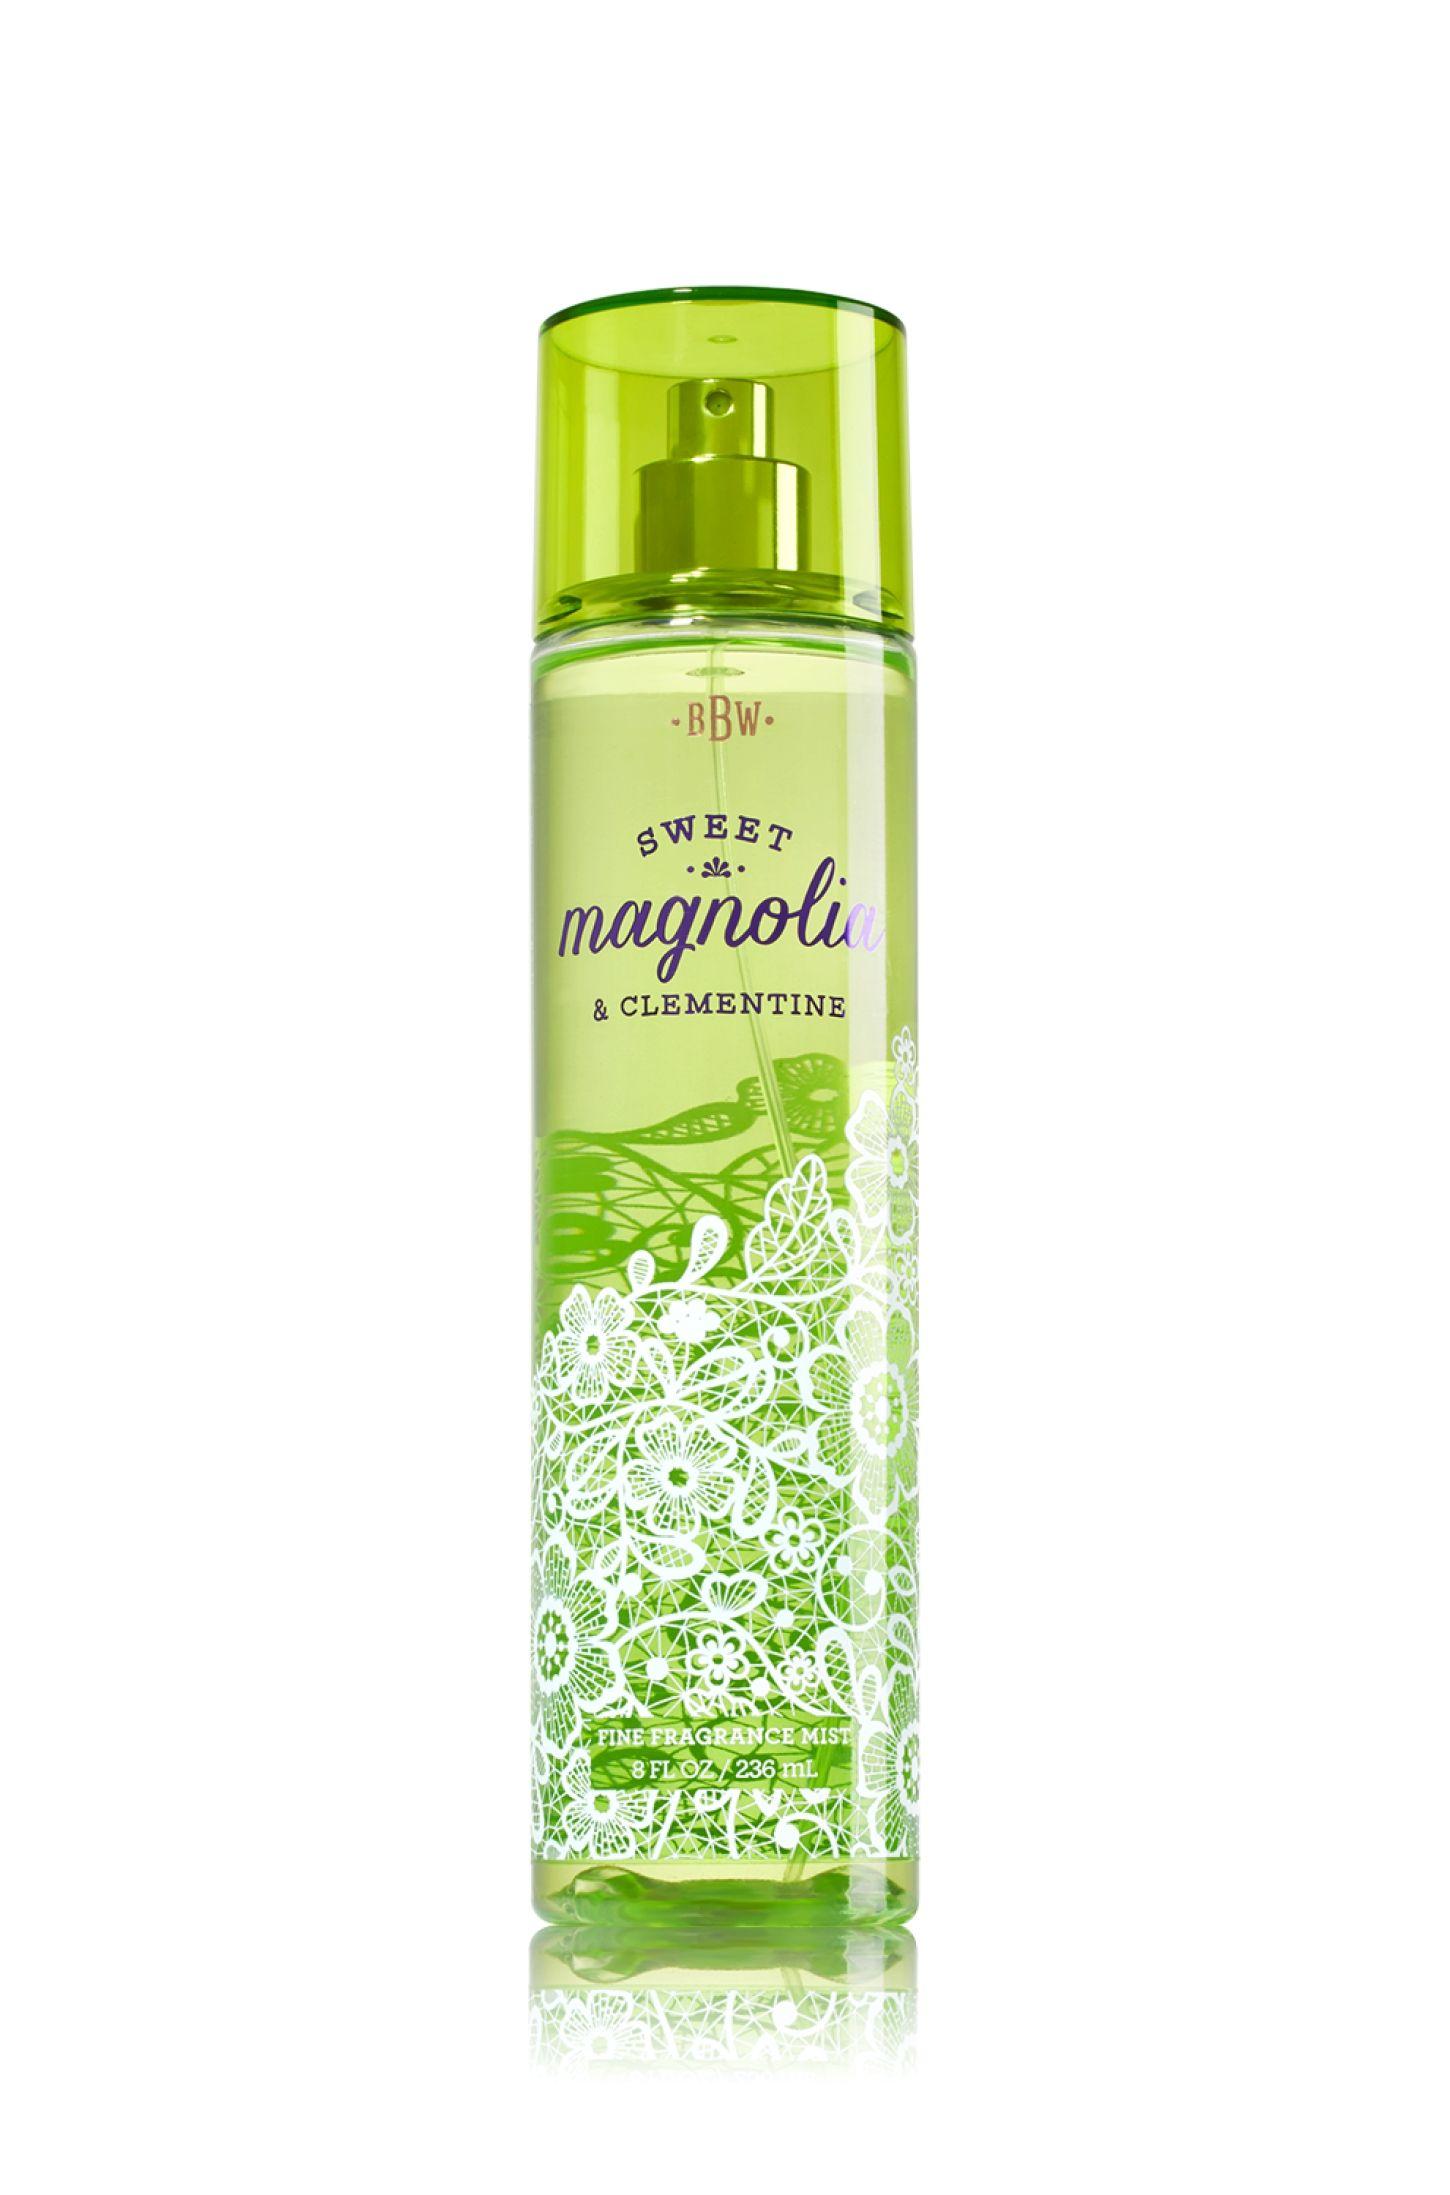 Sweet Magnolia Clementine Fine Fragrance Mist Signature